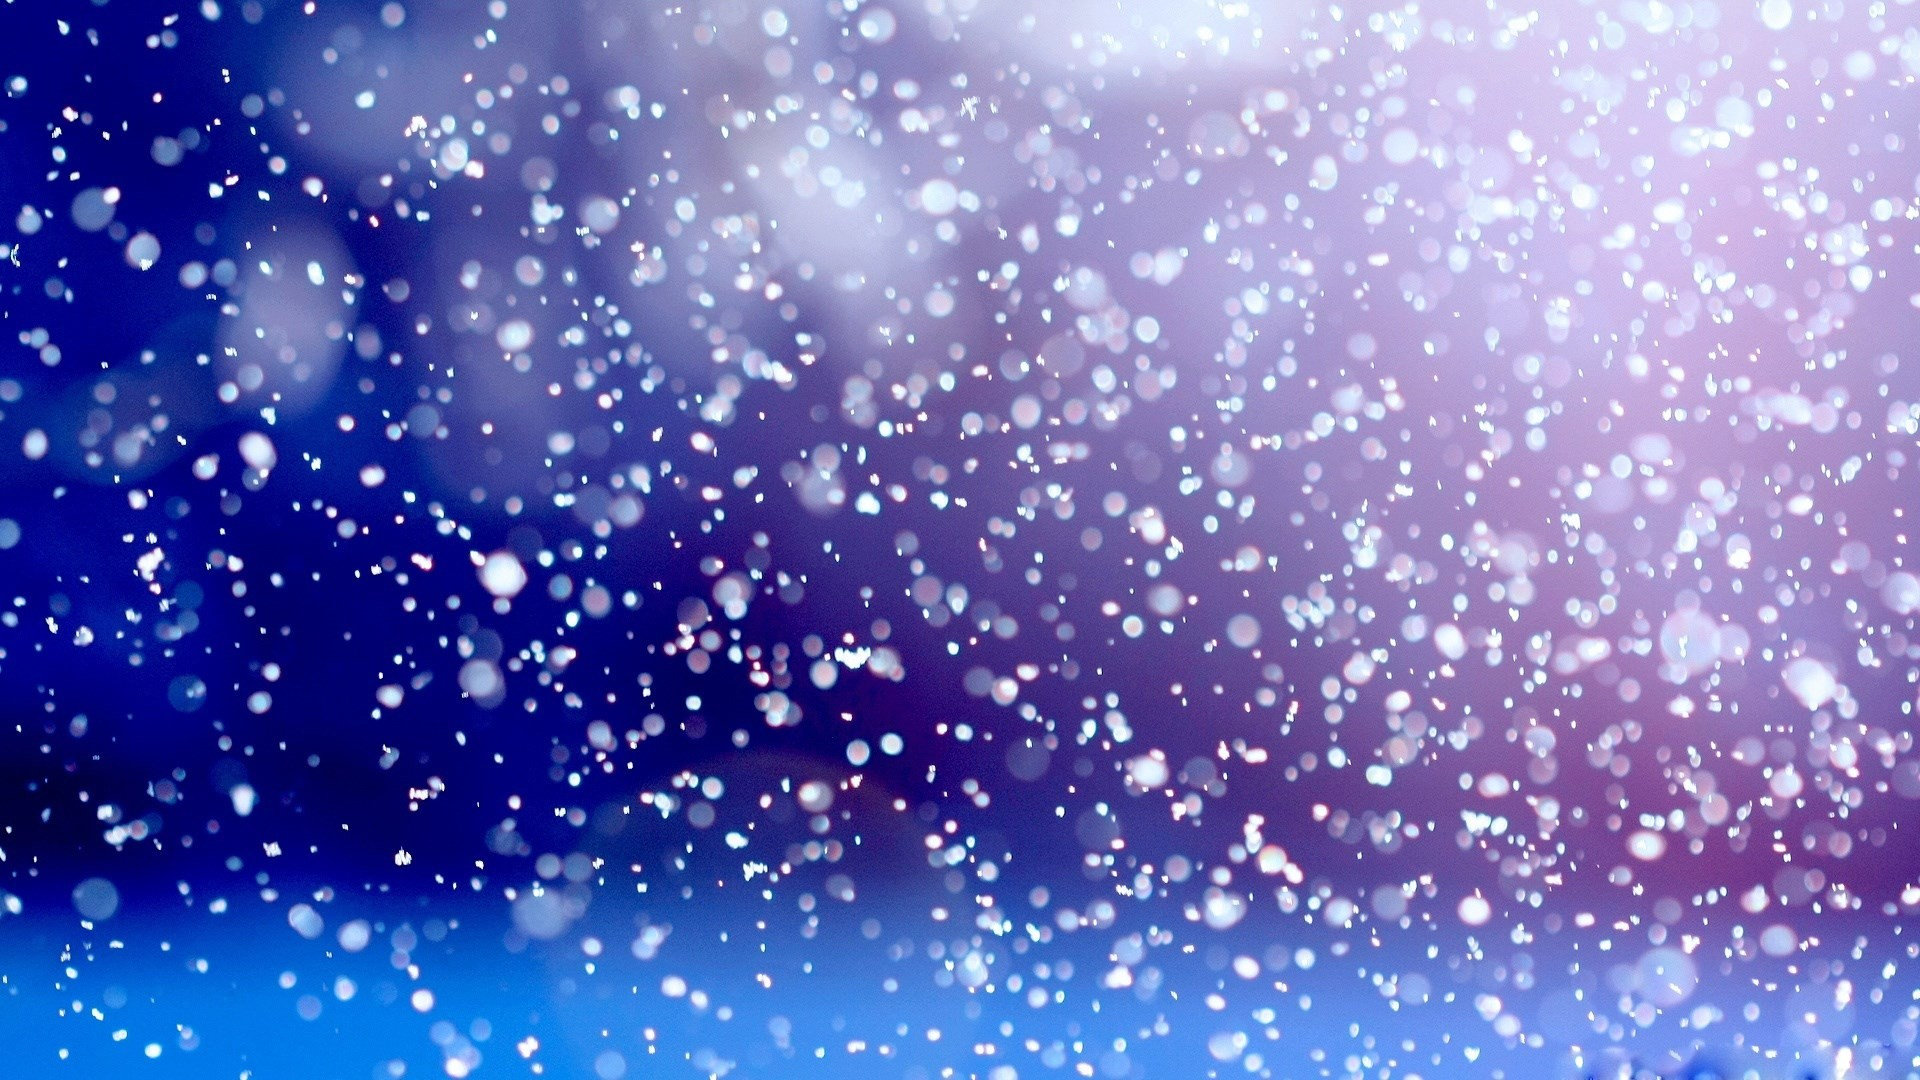 art images snowflake wallpaper hd